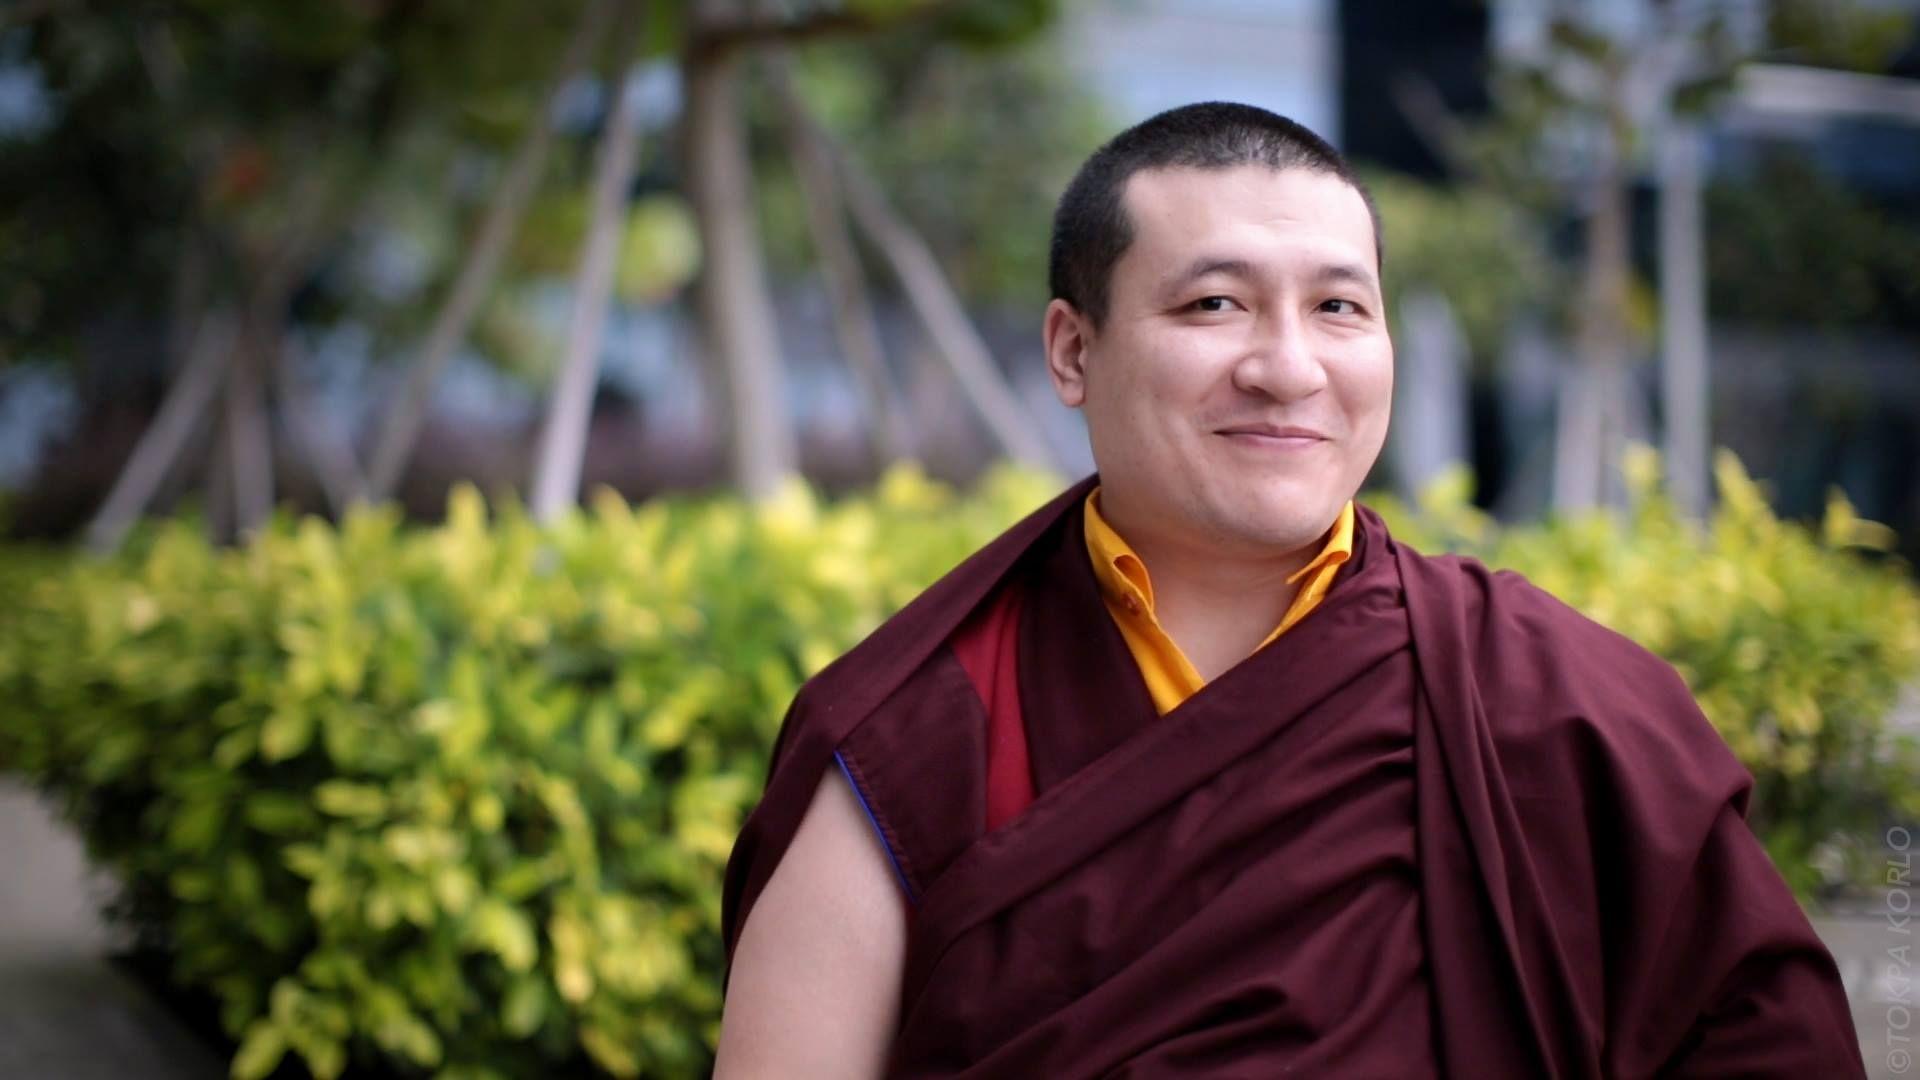 Dharmaageryoject karmapa trinley thaye dorje buddhism dharmaageryoject karmapa trinley thaye dorje altavistaventures Choice Image